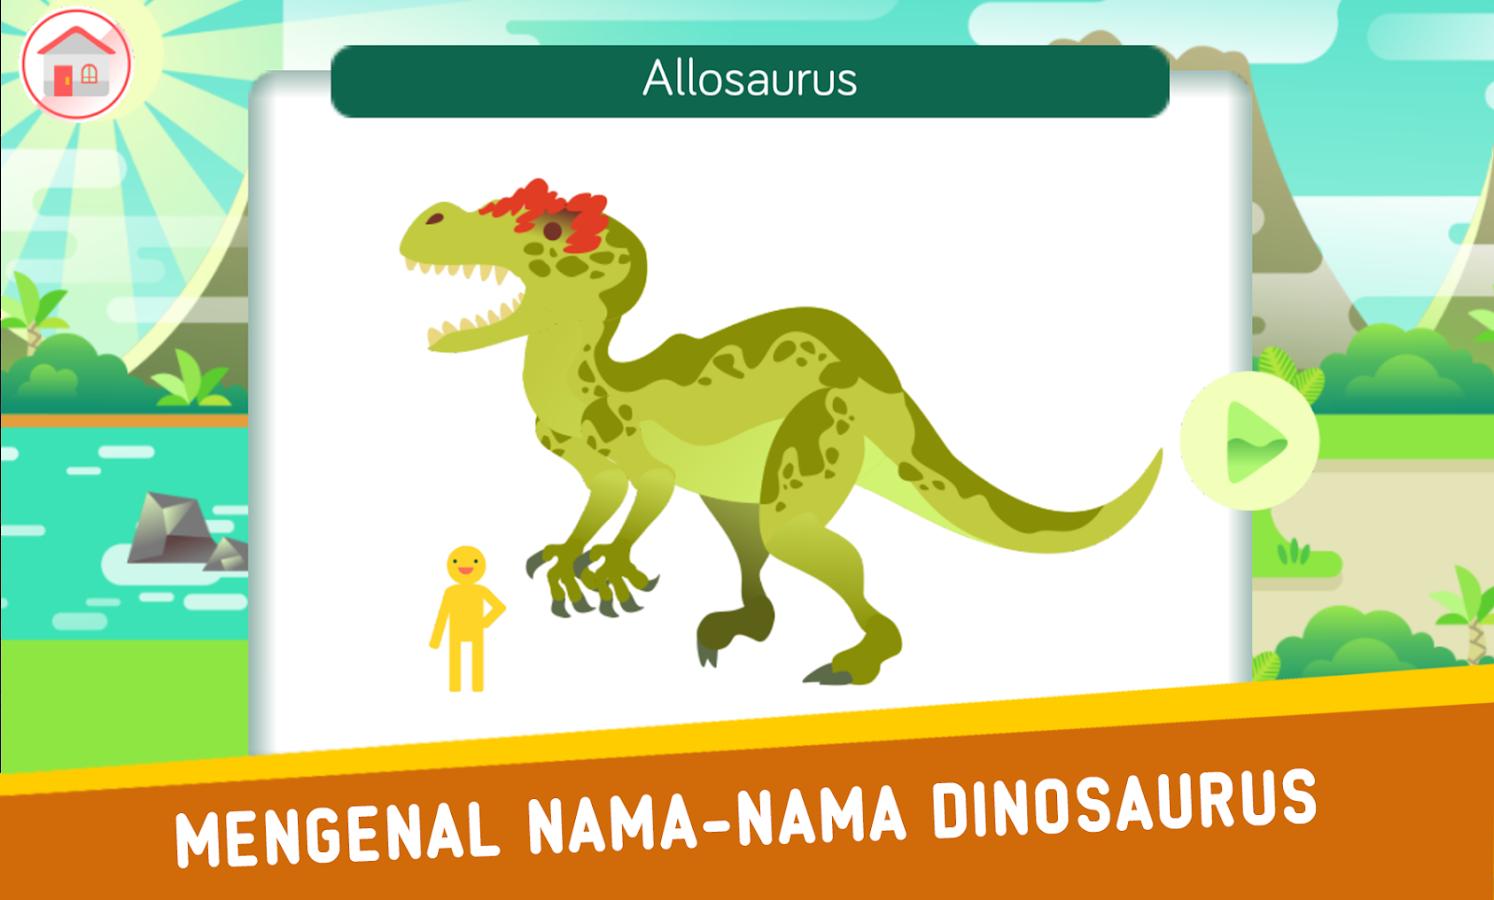 Pippo Belajar Dinosaurus Android Appar P Google Play